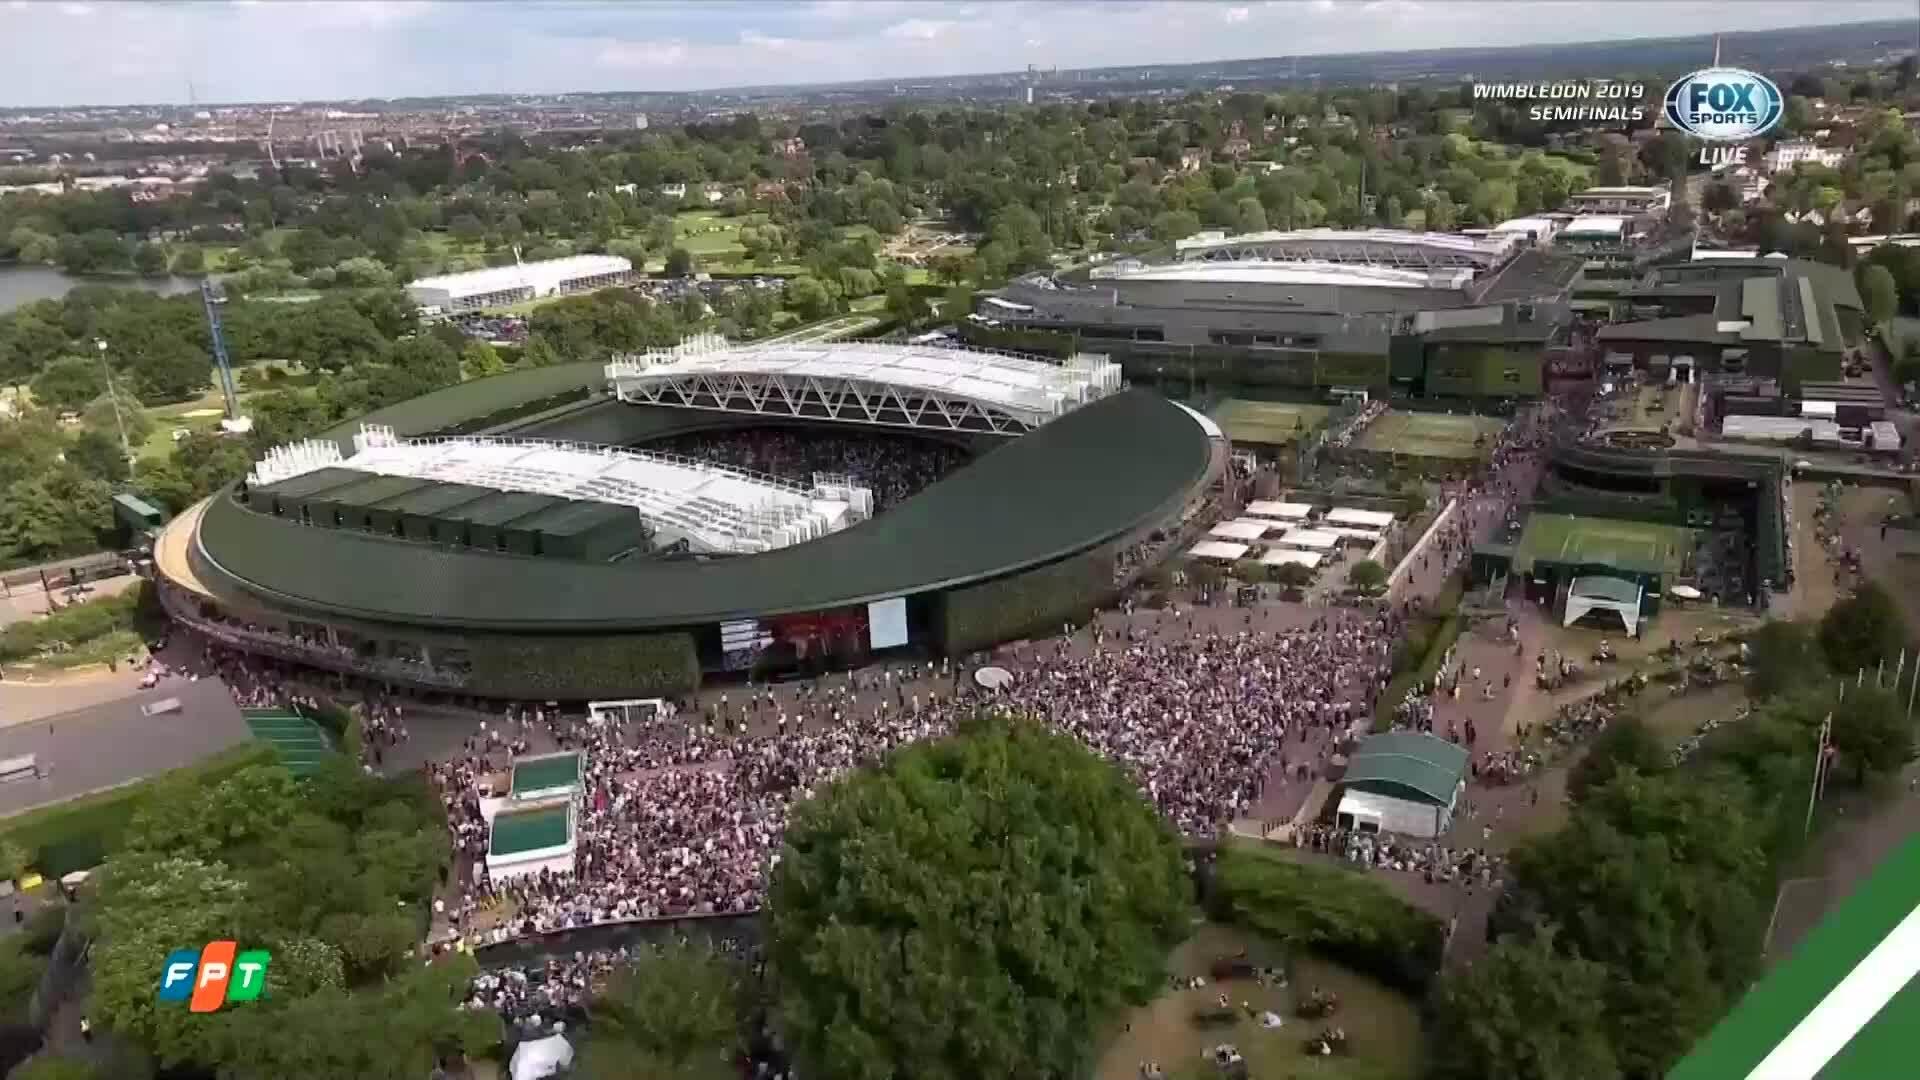 Nadal 1-3 Federer